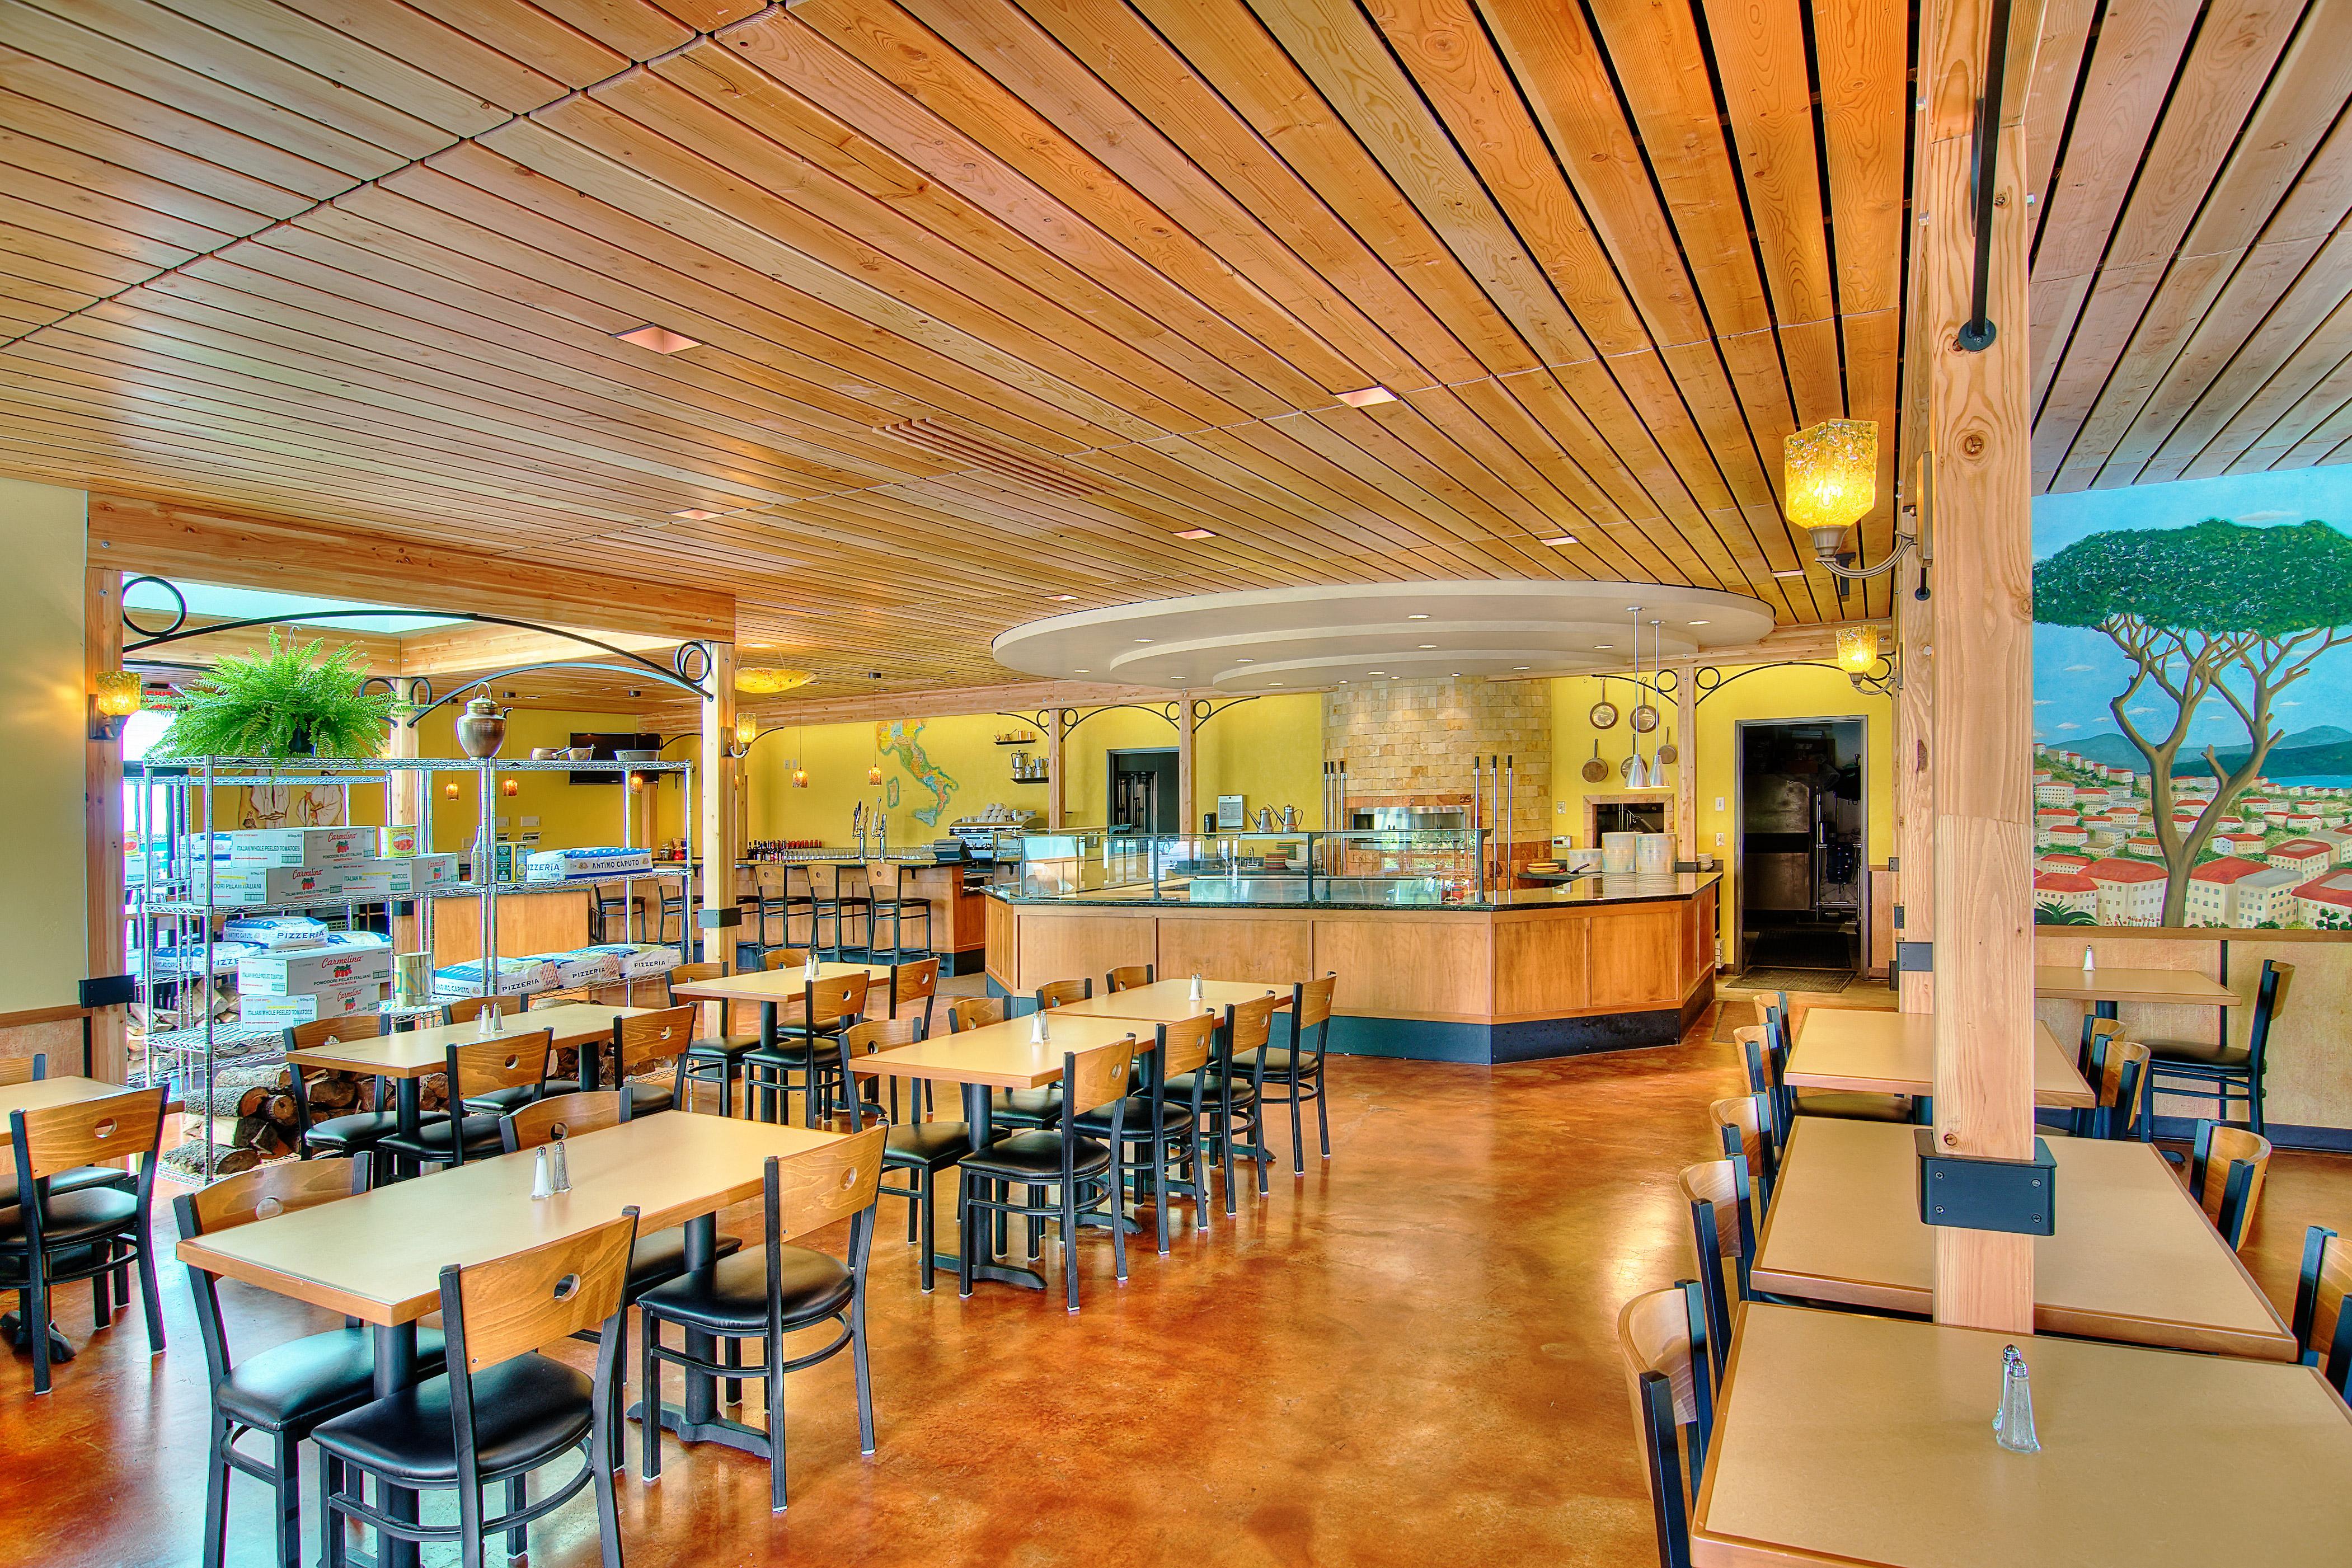 Laperla Interior Dining 2 Nir Pearlson Architect